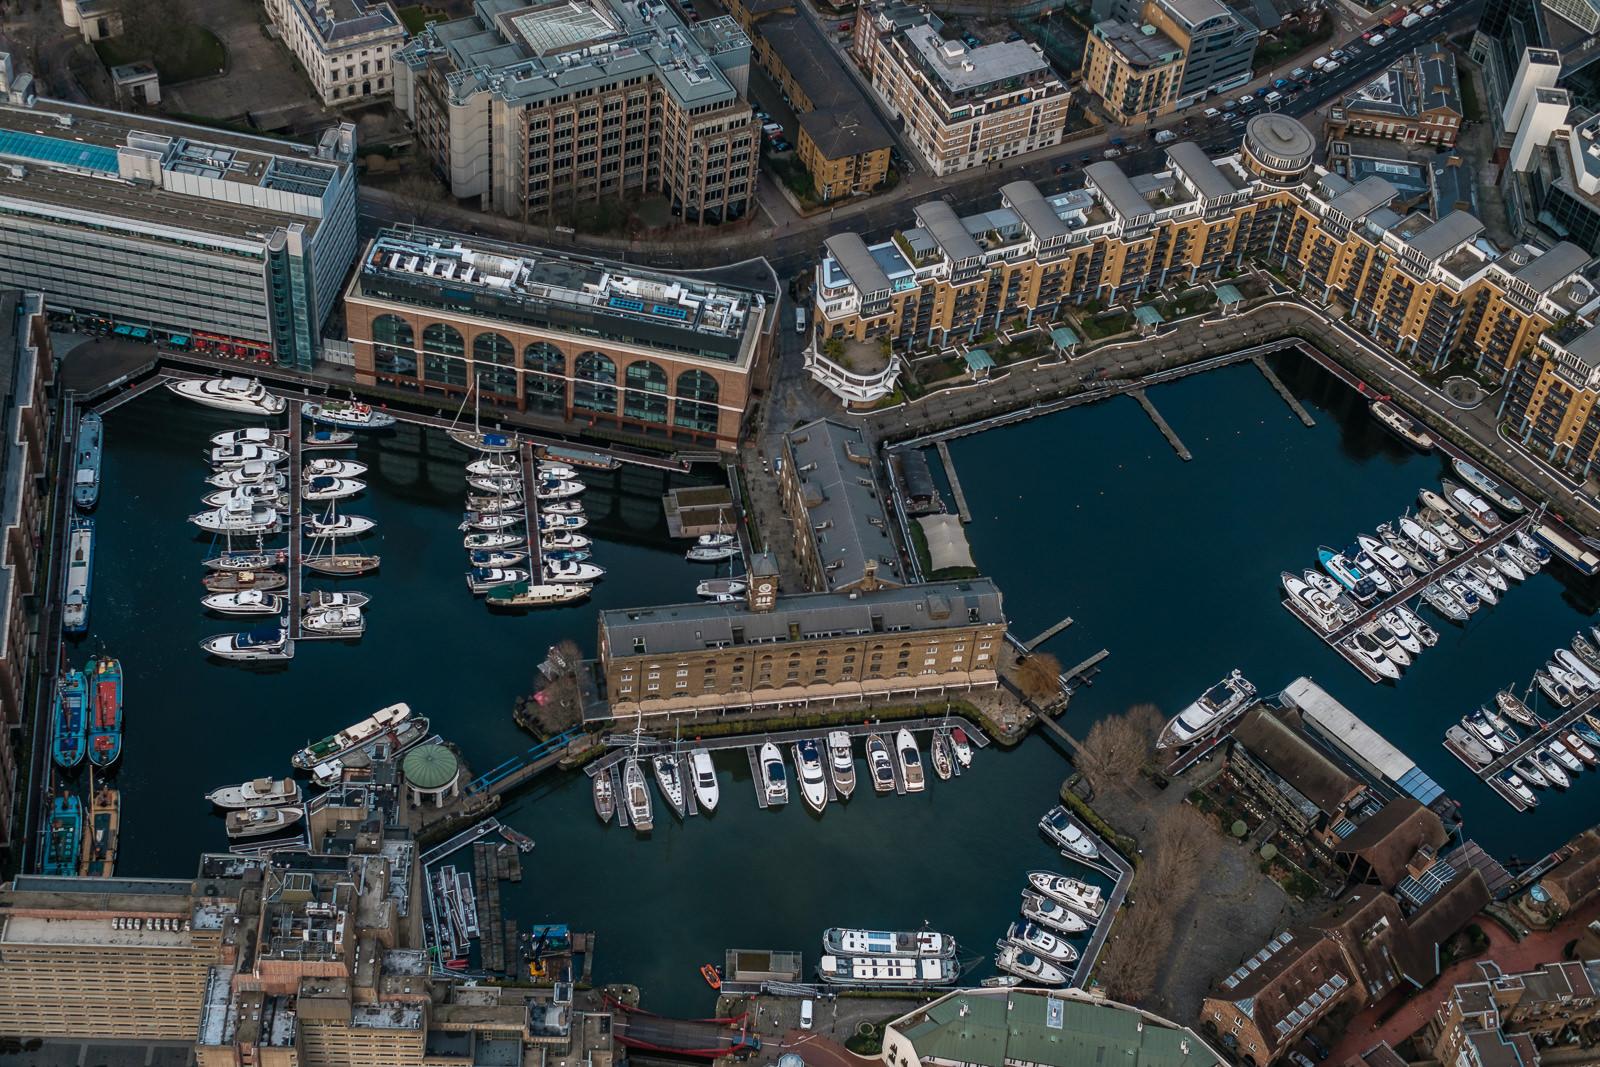 St. Katharine Docks Marina; X-Pro2 ISO200 35mm f2.8 1/1000s